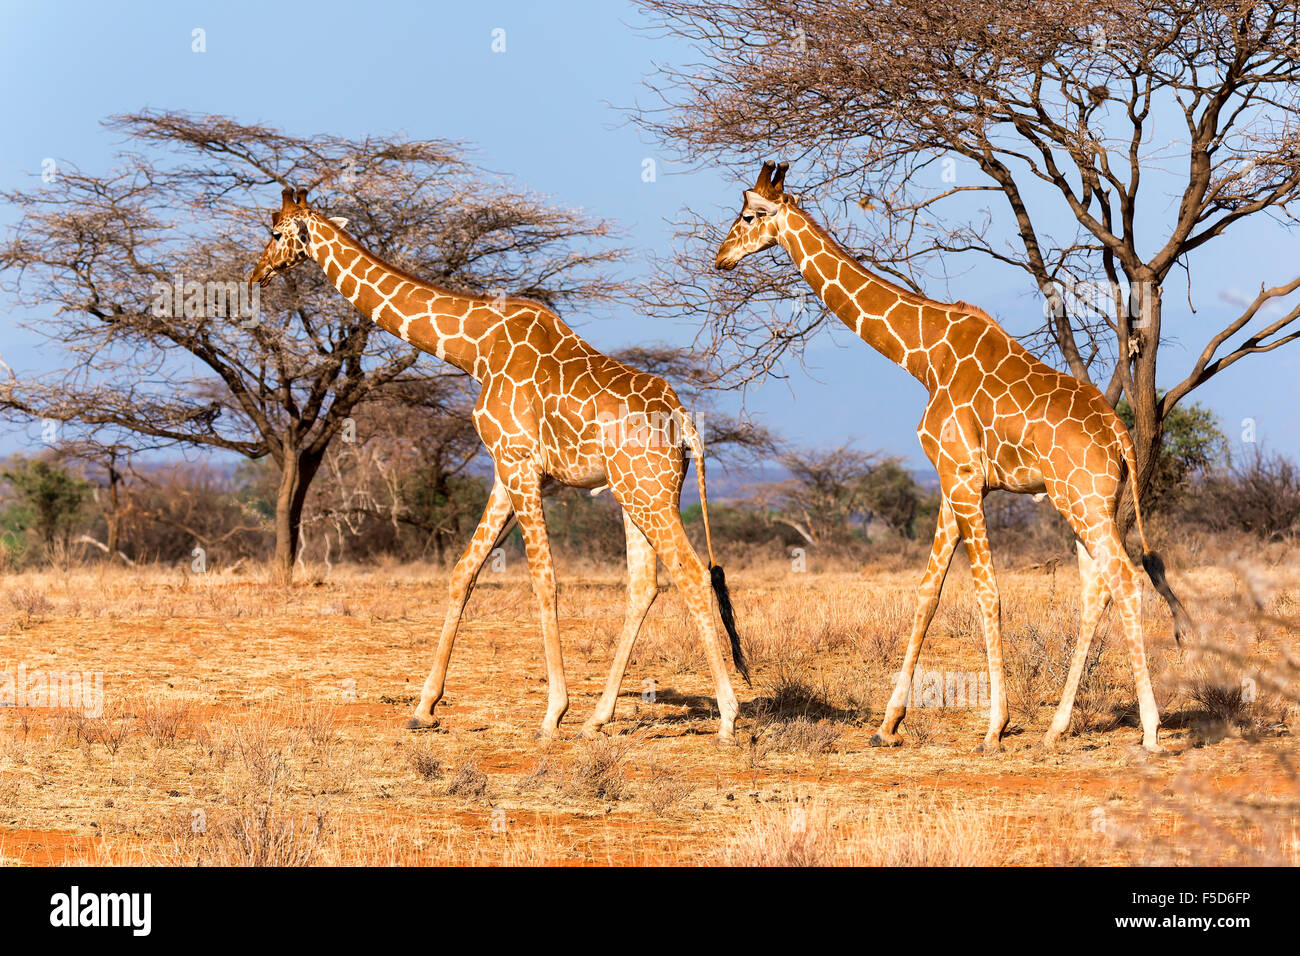 Les Girafes réticulée ou Somali girafes (Giraffa camelopardalis reticulata) passant par l'acacia (Acacia sp.) Banque D'Images